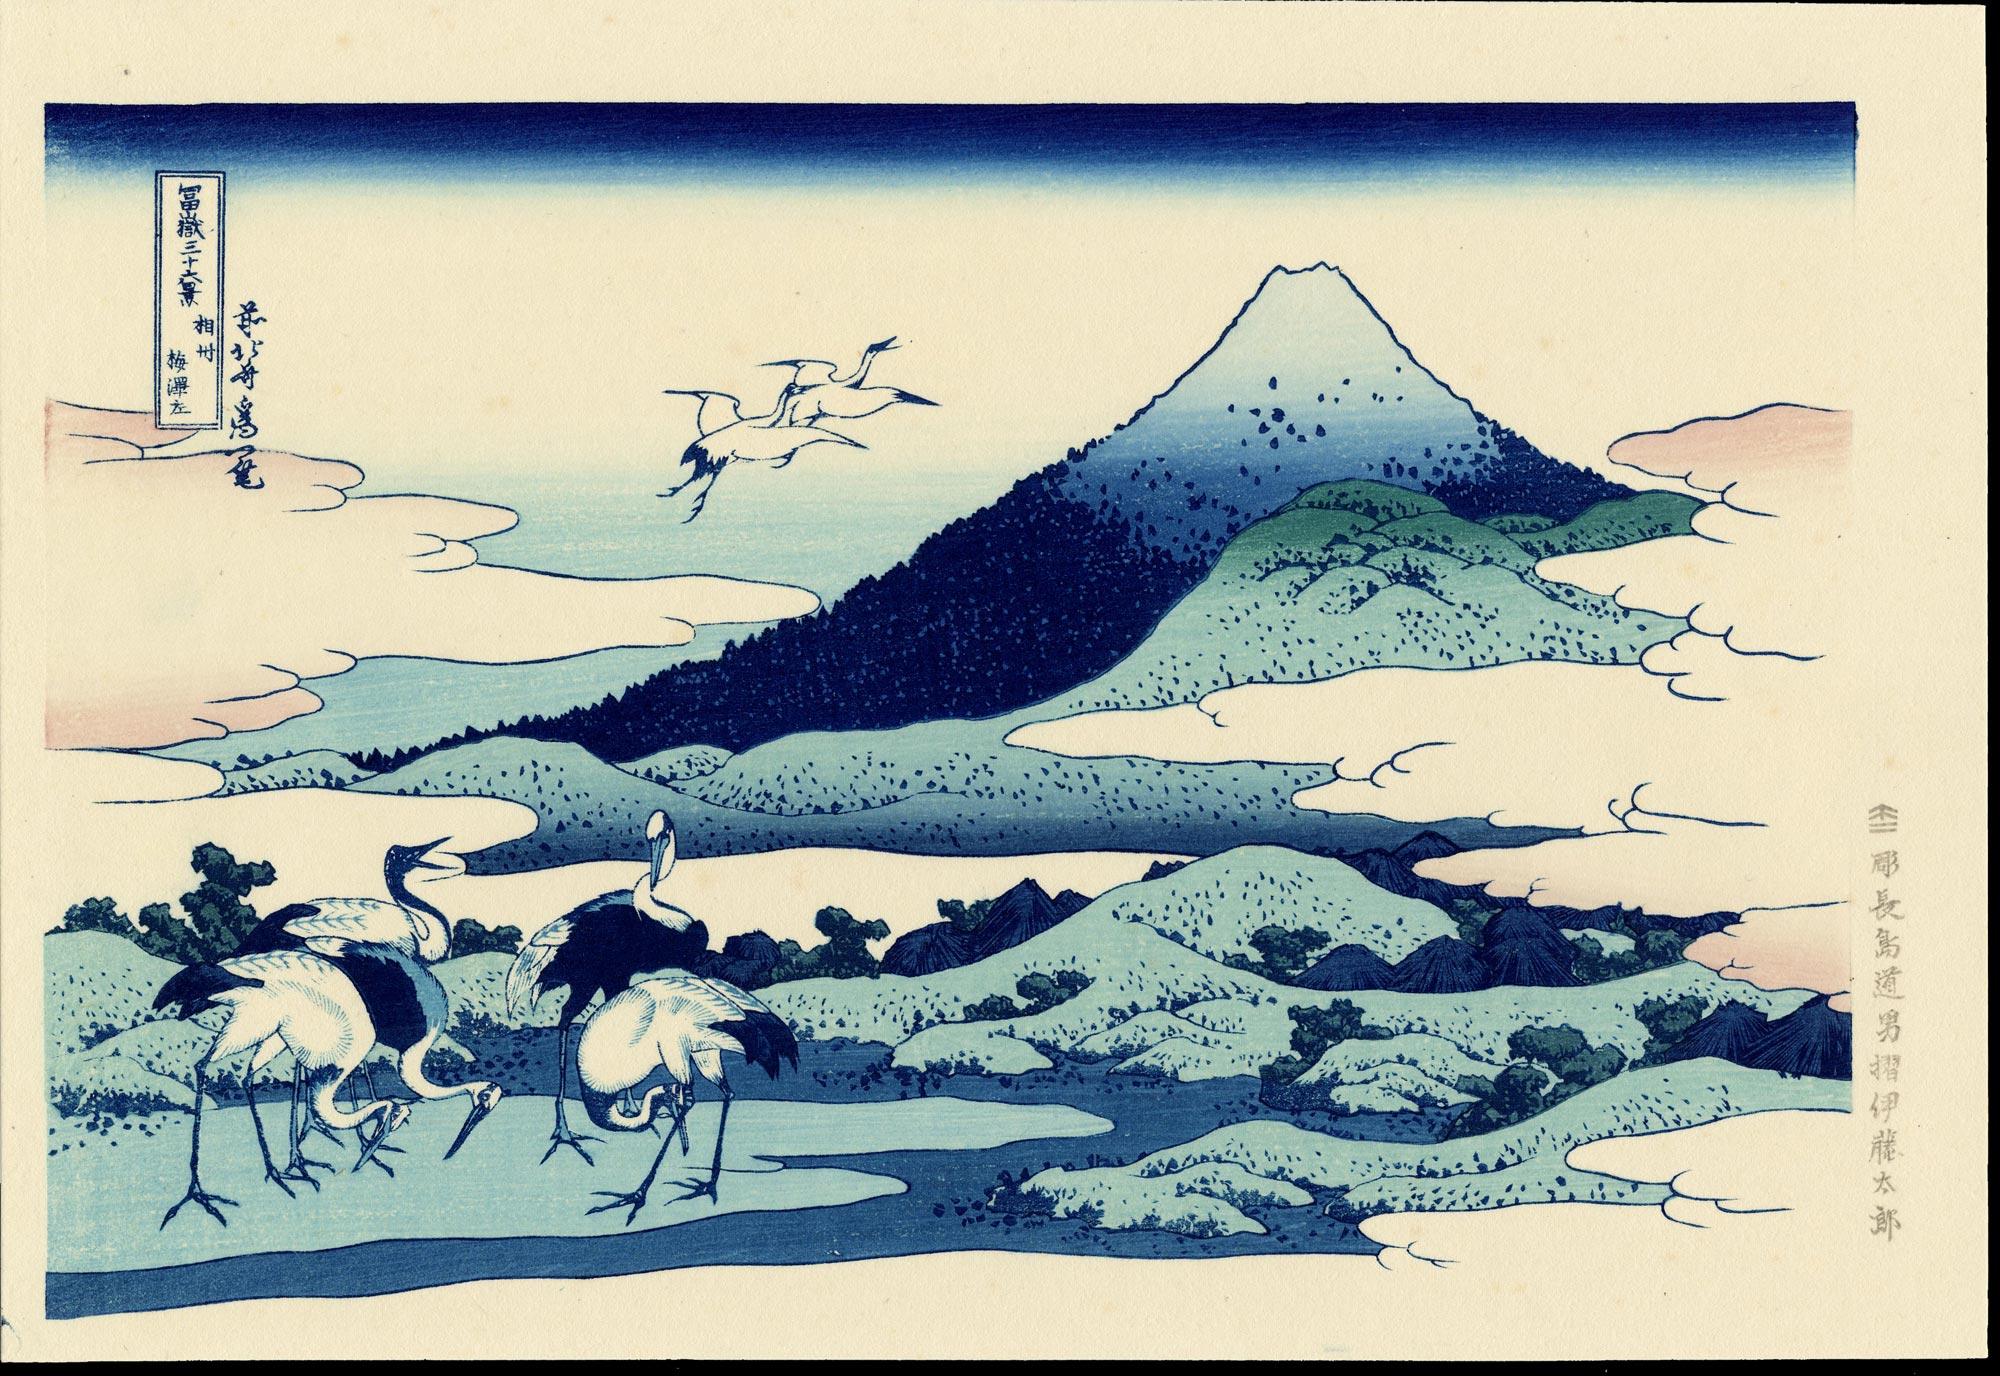 Mt Fuji Painting Images